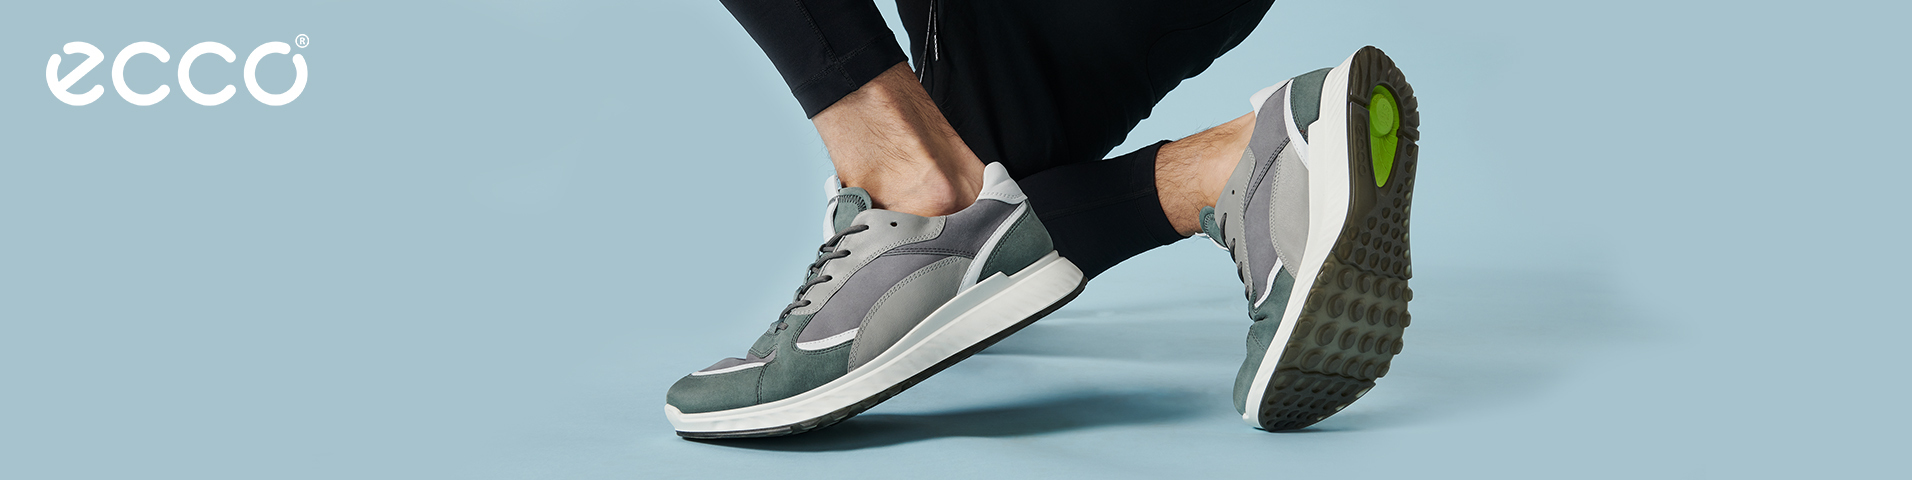 Ecco Online Shop | Aktuelle ecco Schuh Kollektion | ZALANDO